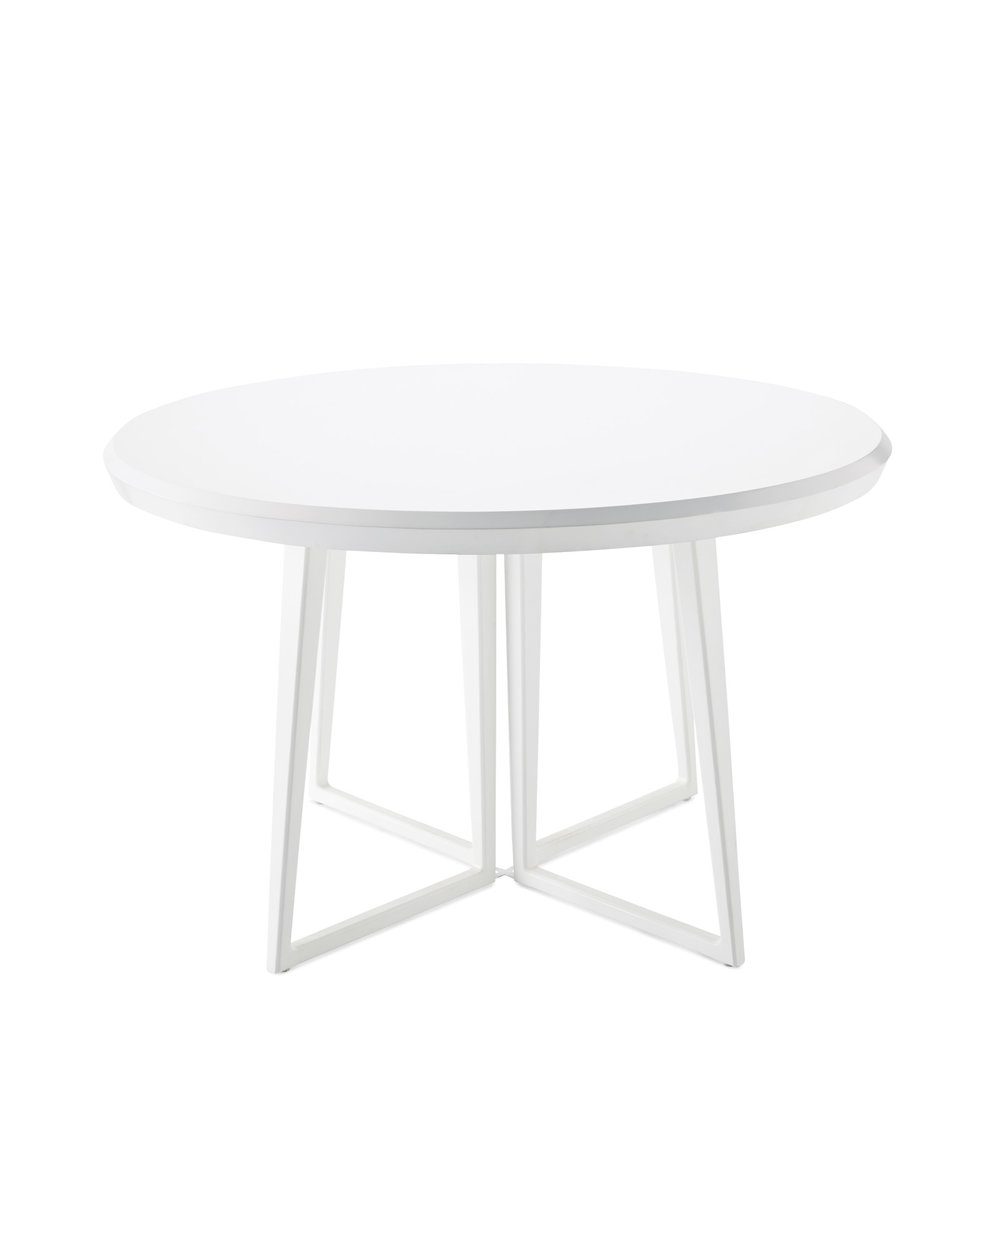 Furn_Dining_Table_Downing_Round_White_MV_Crop_SH.jpg